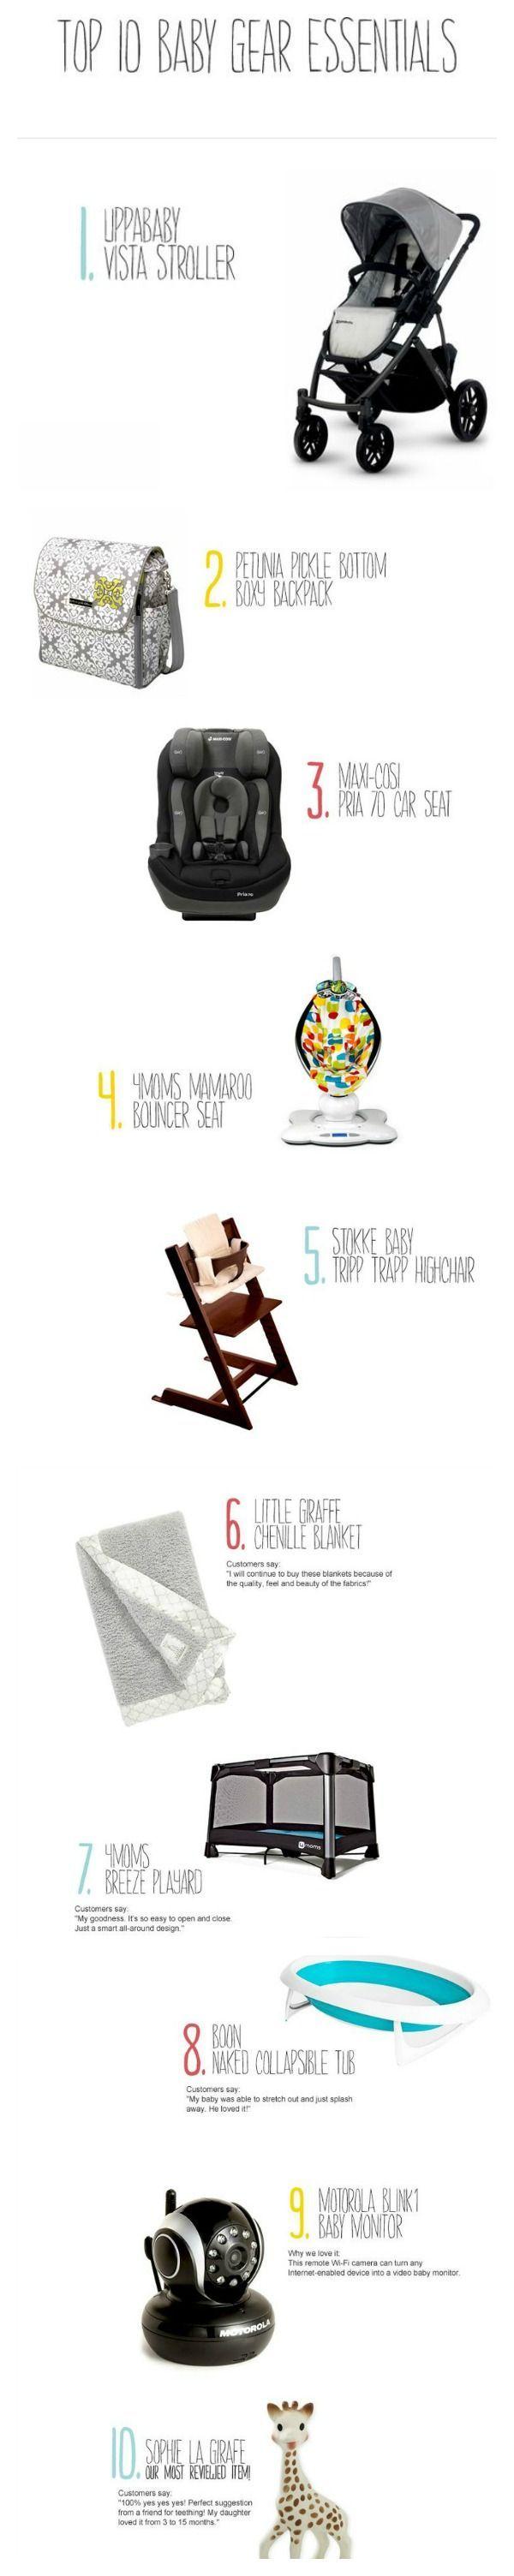 Top 10 Baby Gear Essentials!